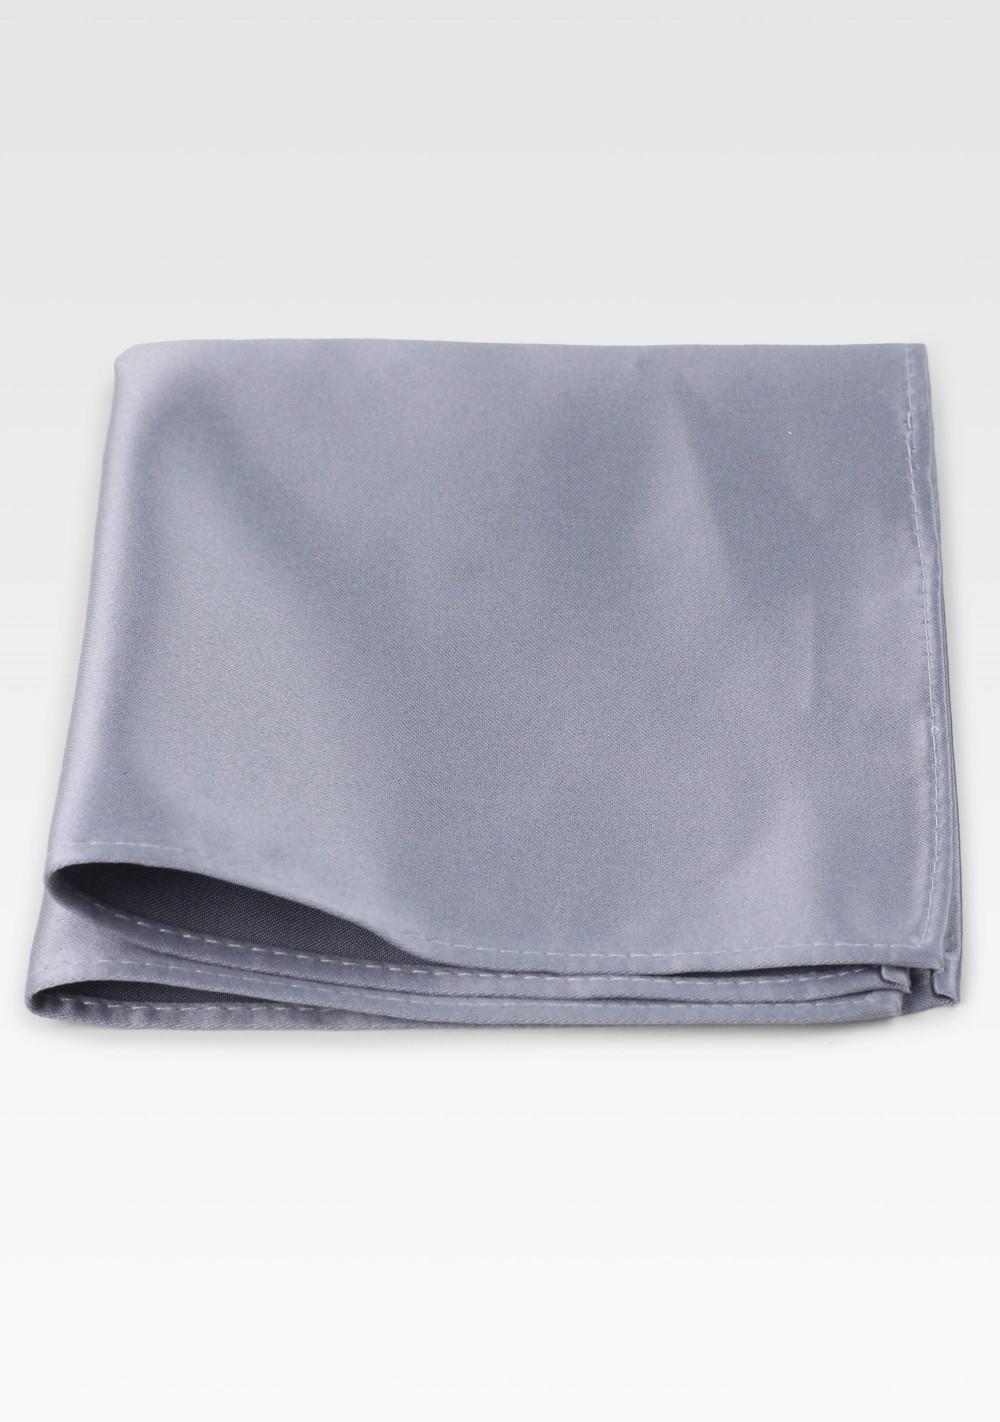 Shiny Silver Pocket Square